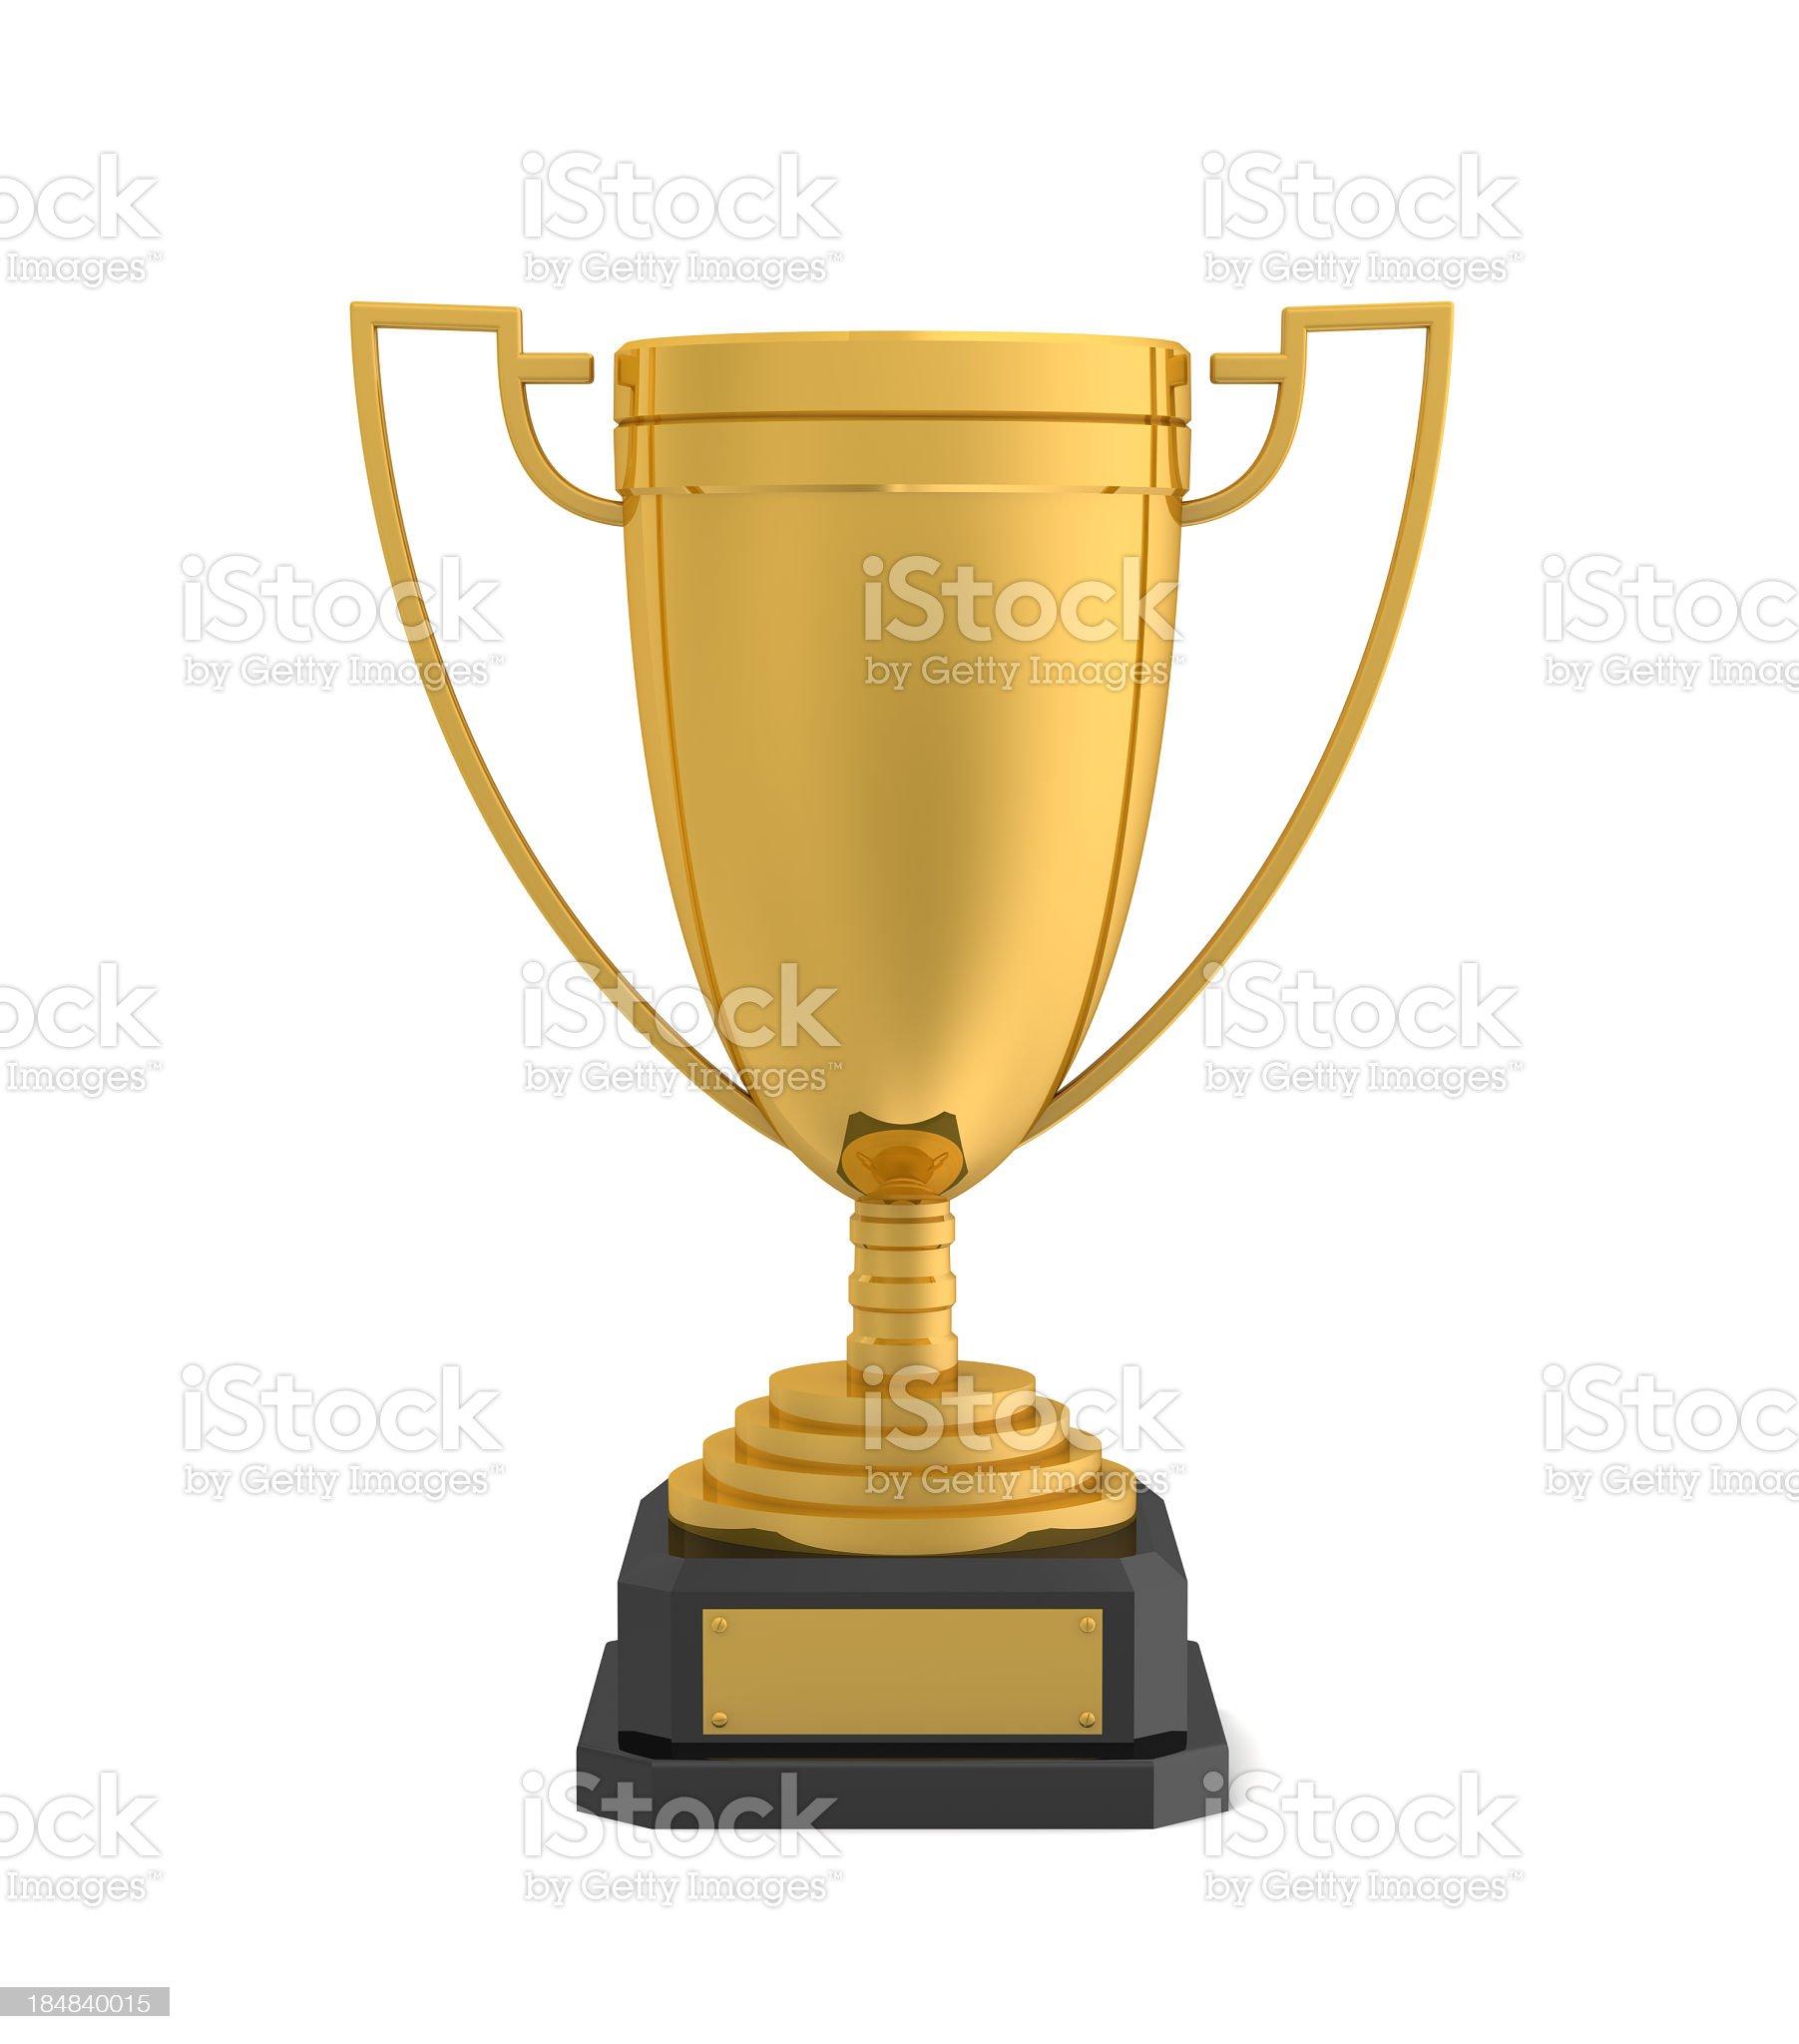 Gold Award Cup royalty-free stock photo